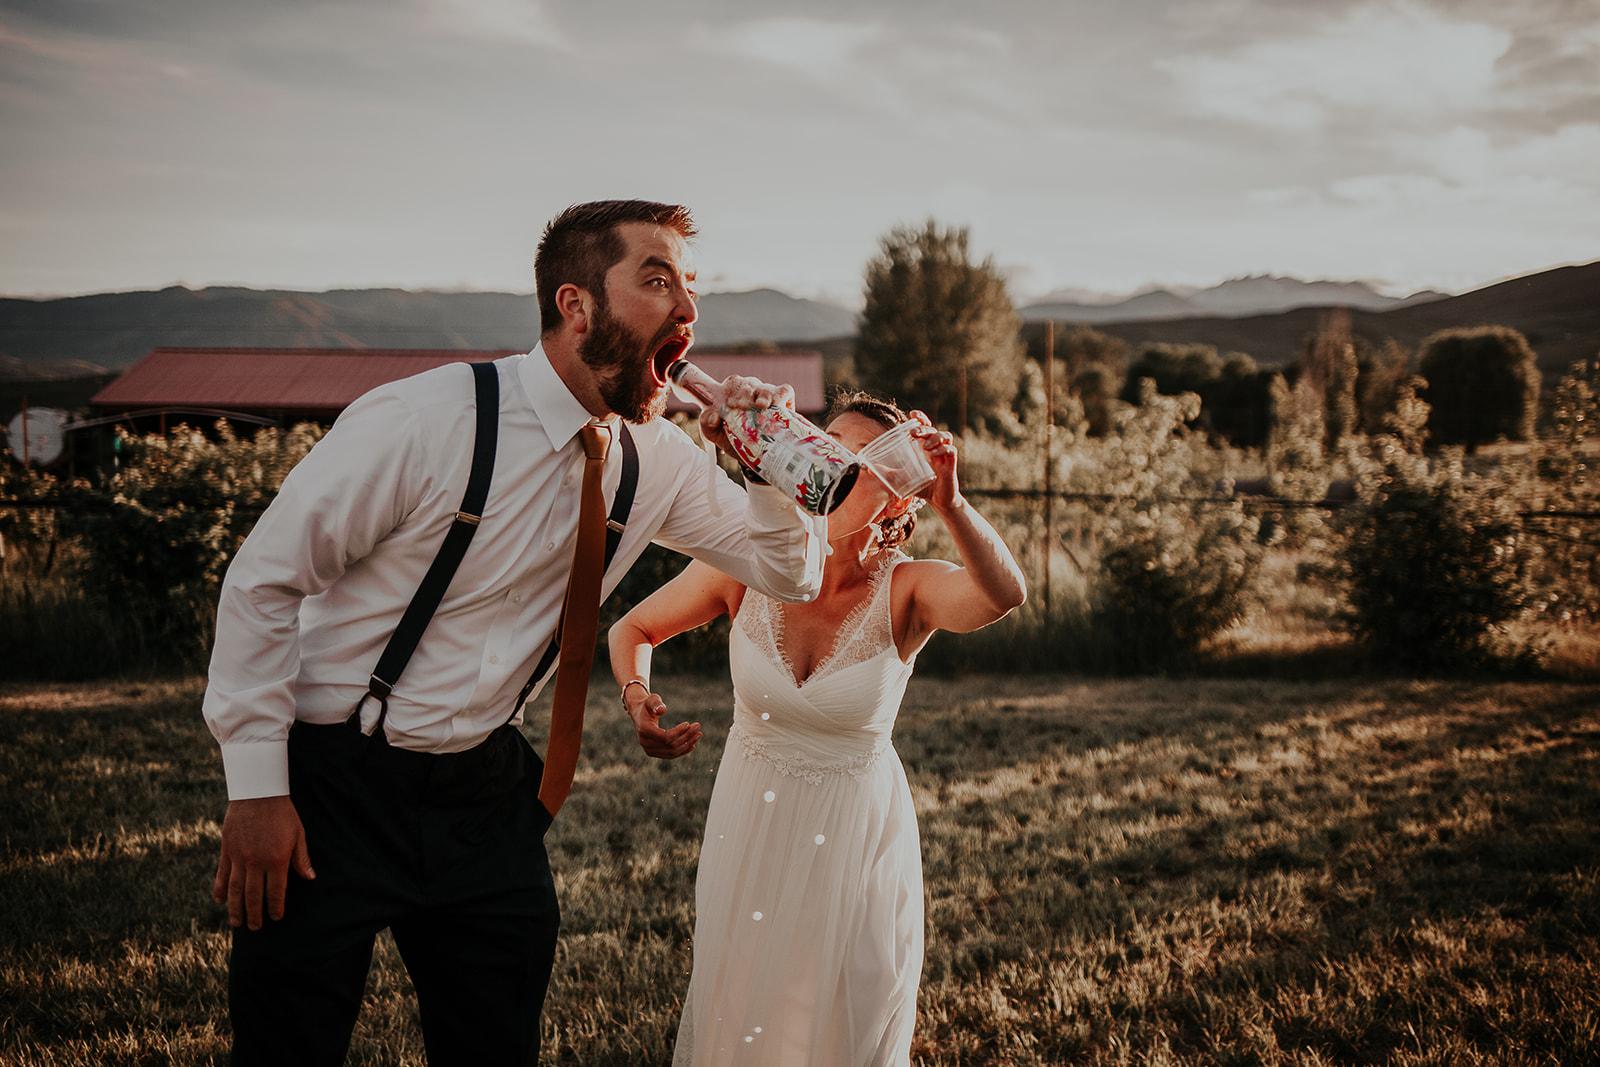 north-cascades-elopement-wedding-winthrop-wedding-photographer-megan-gallagher-photography (36).jpg